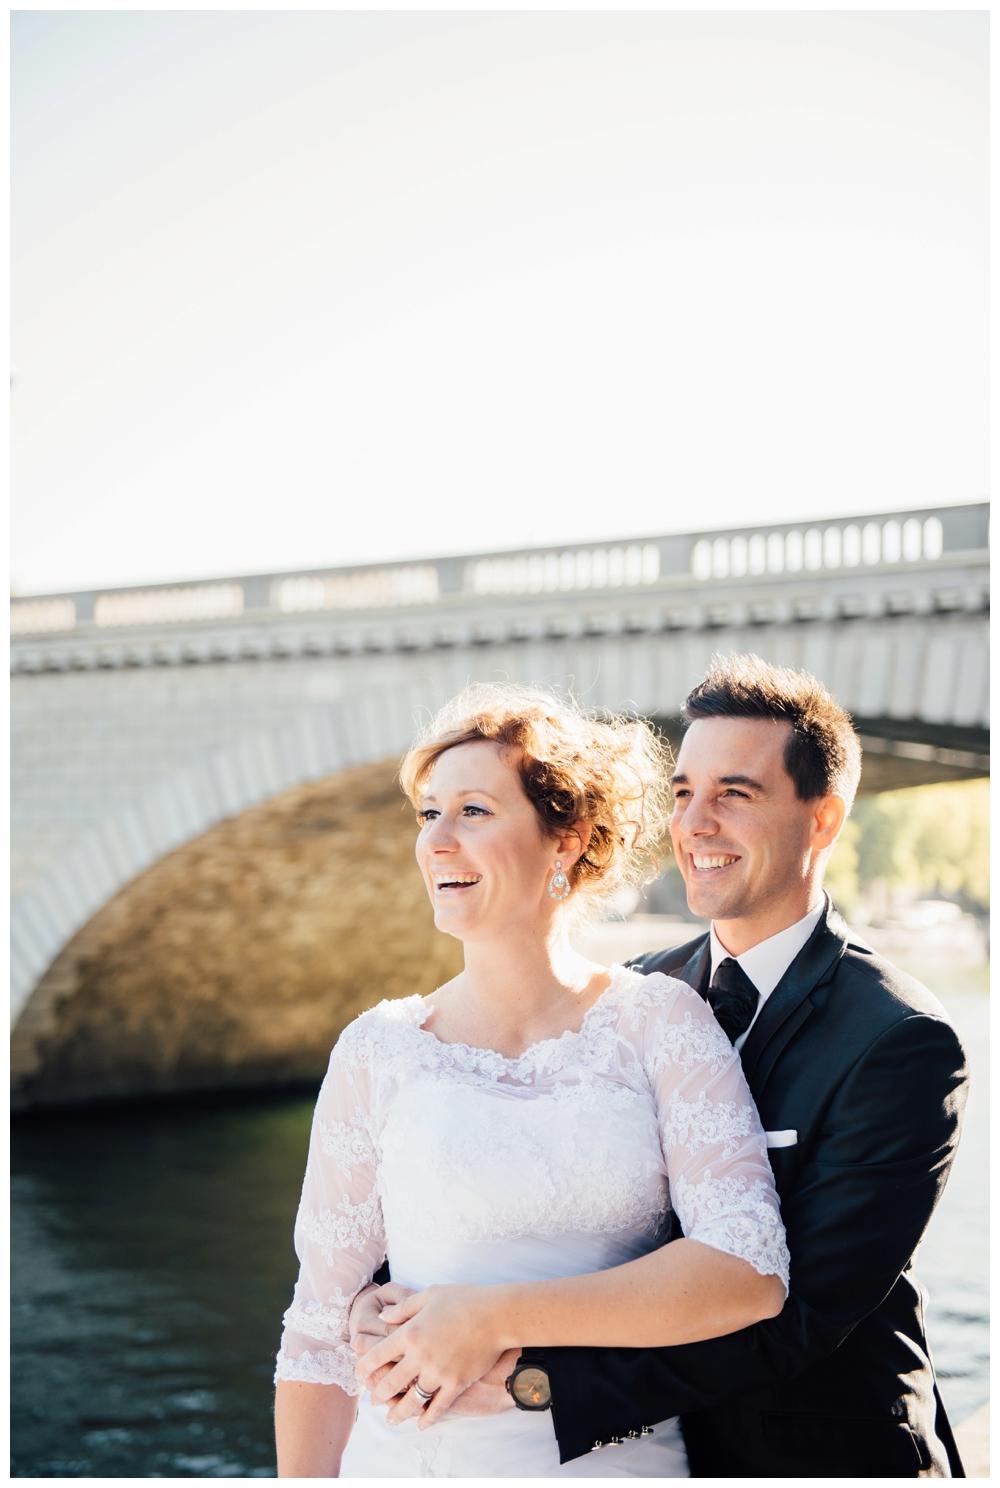 day after paris mariage reportage seance photo couple love sessionblog les marieuses 007